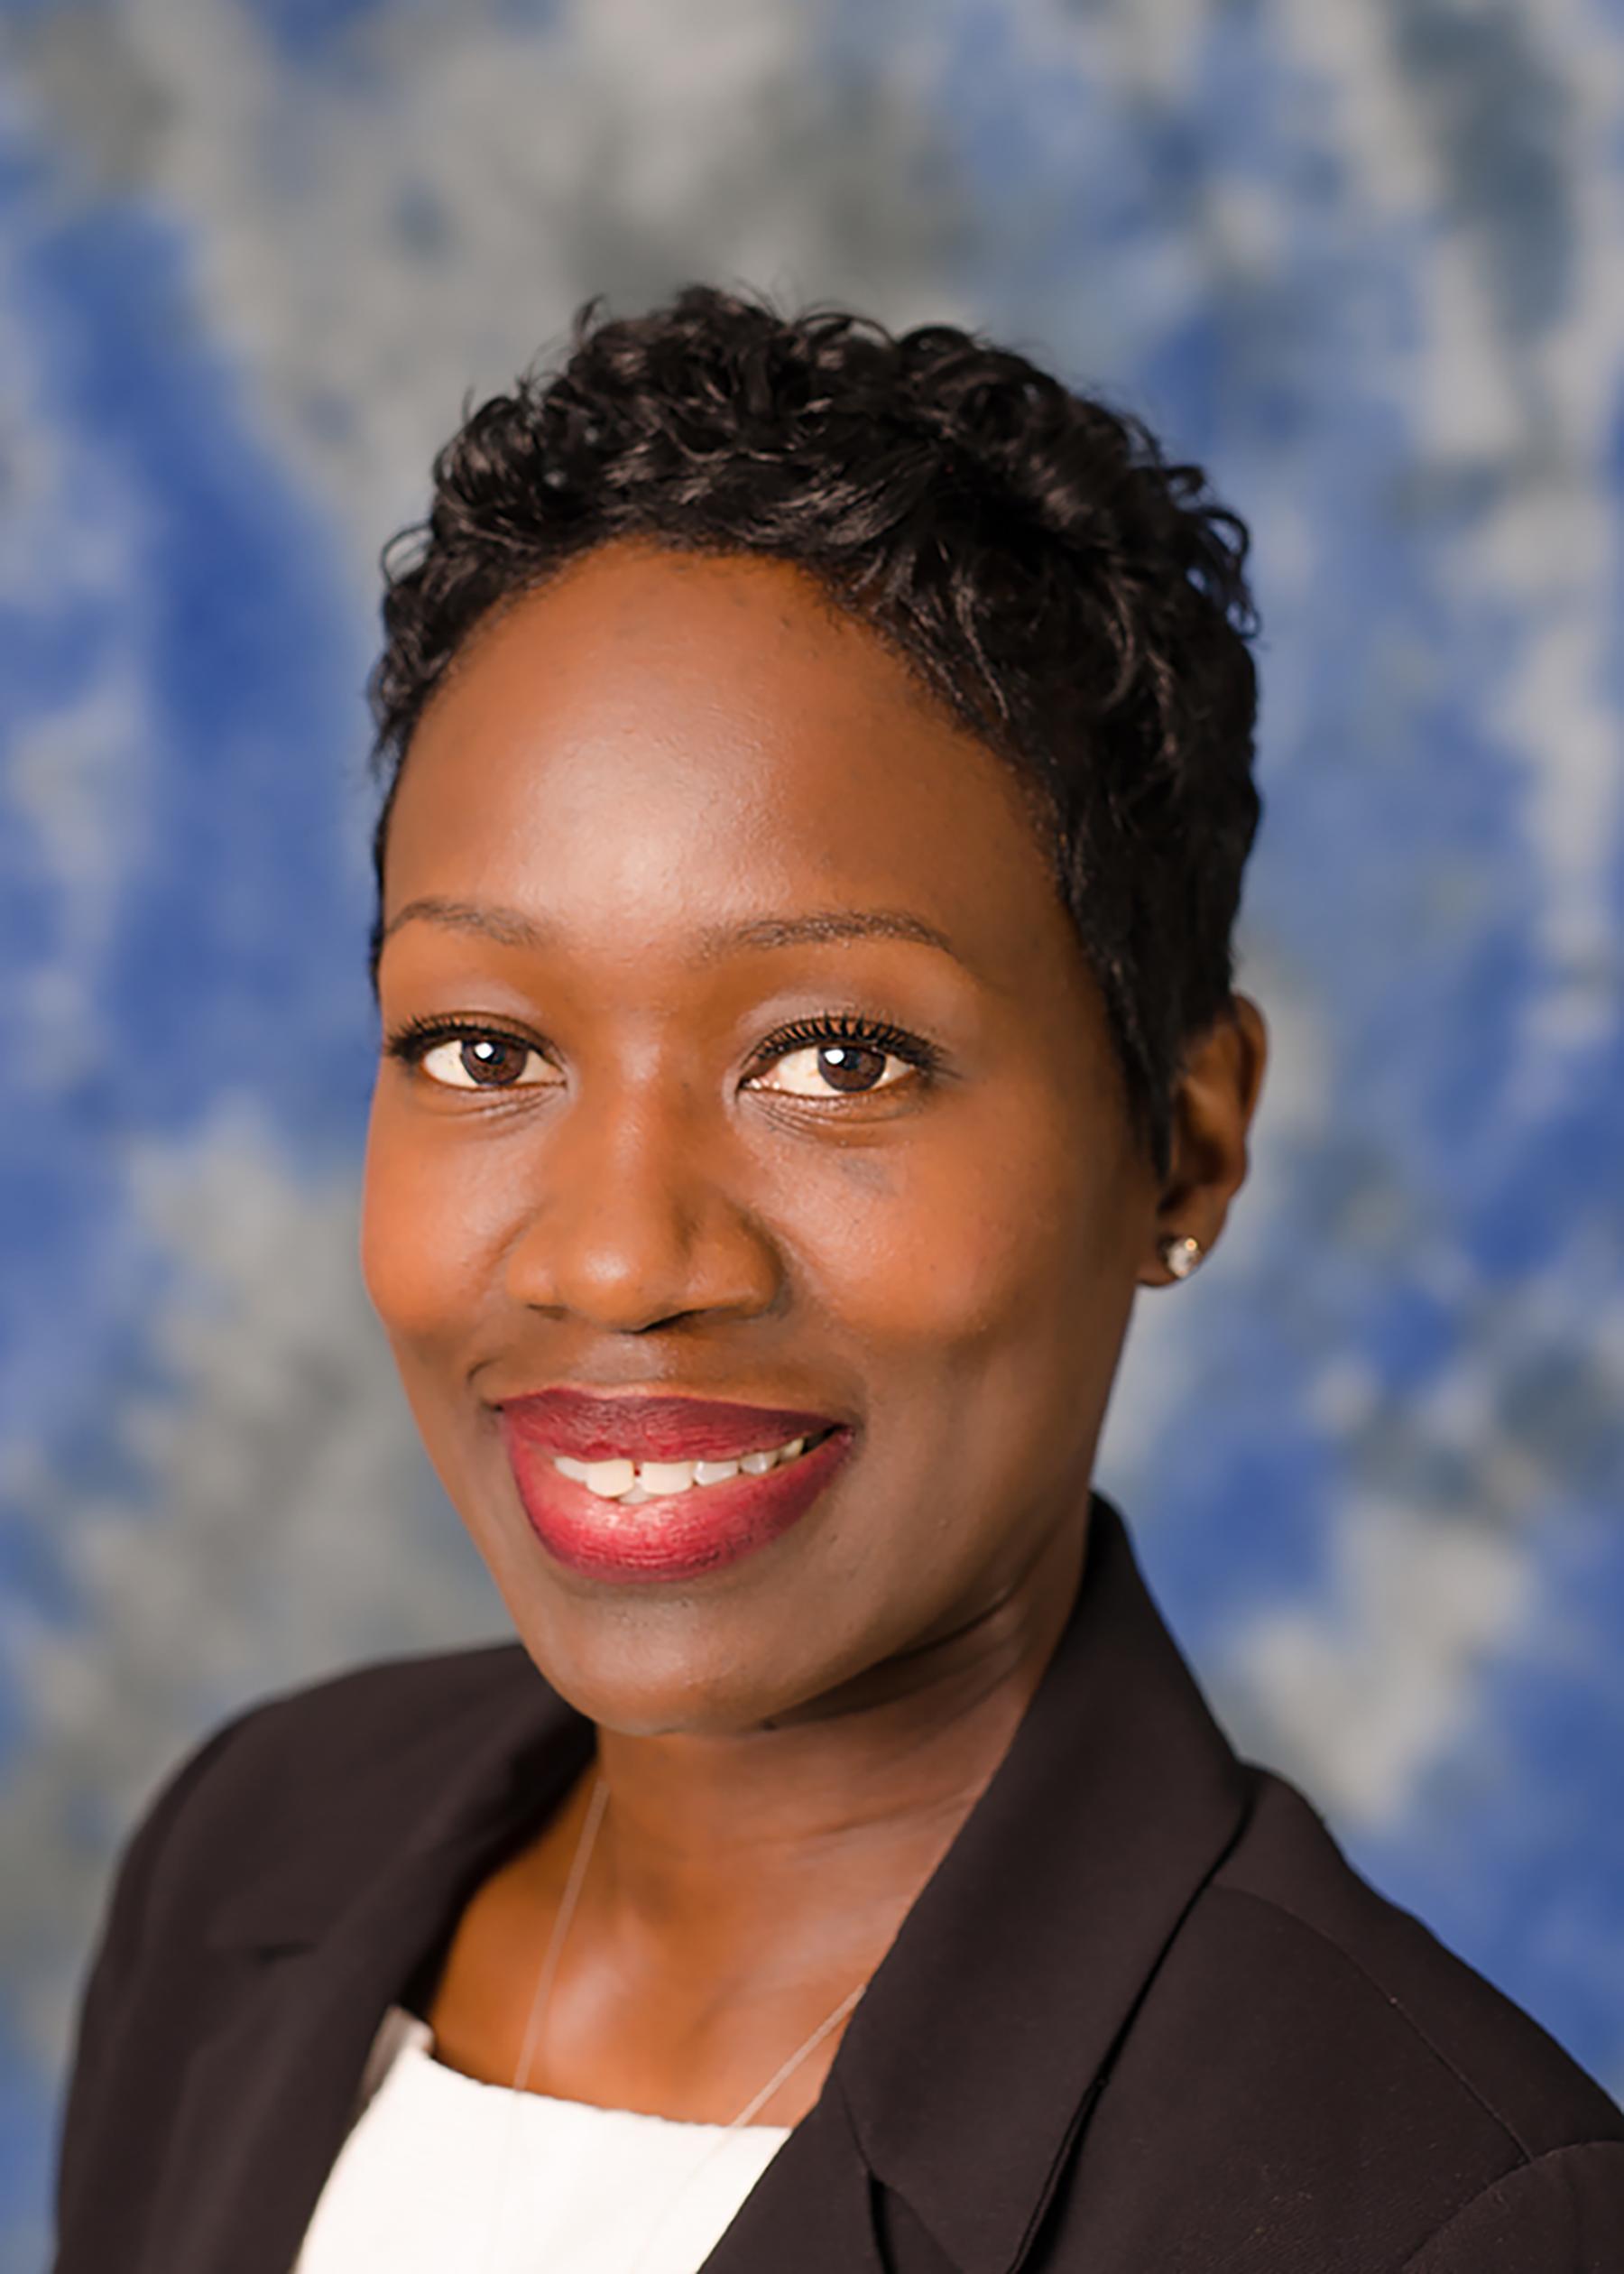 Atlanta GA female executive headshot